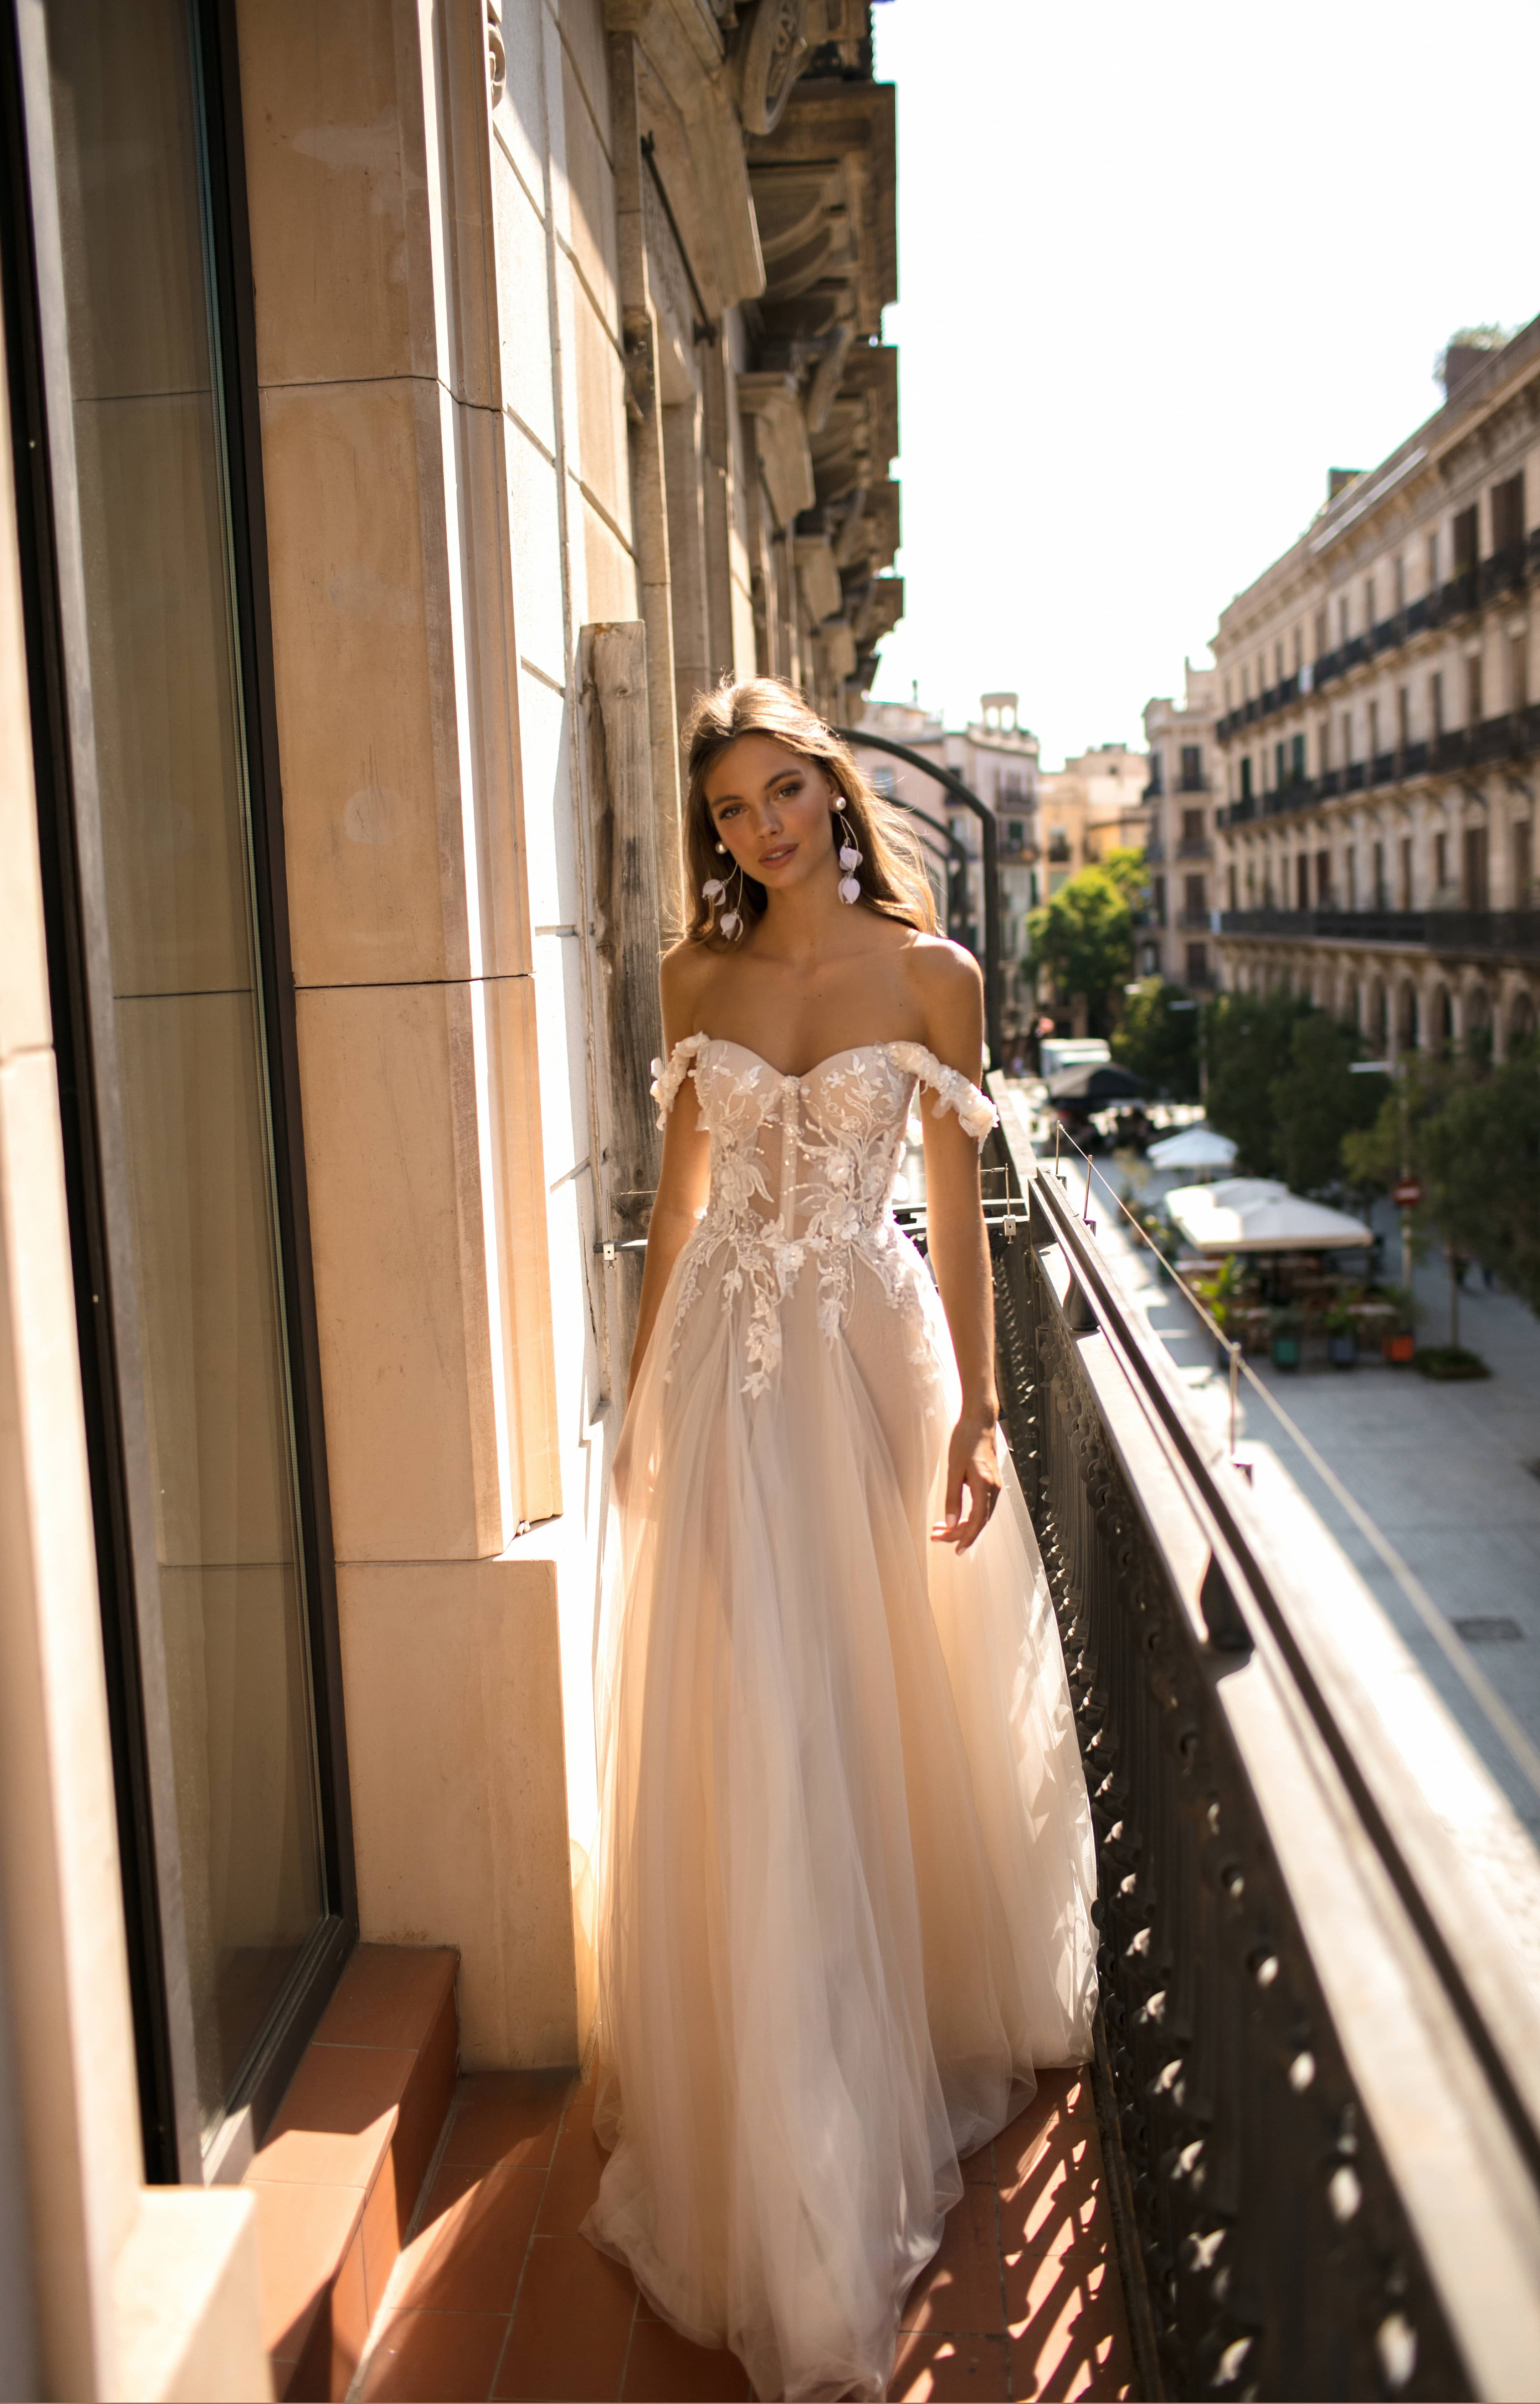 NYBFW: MUSE by Berta & Berta Privee Are Ultimate Bridal Dress Goals! #bertaweddingdress